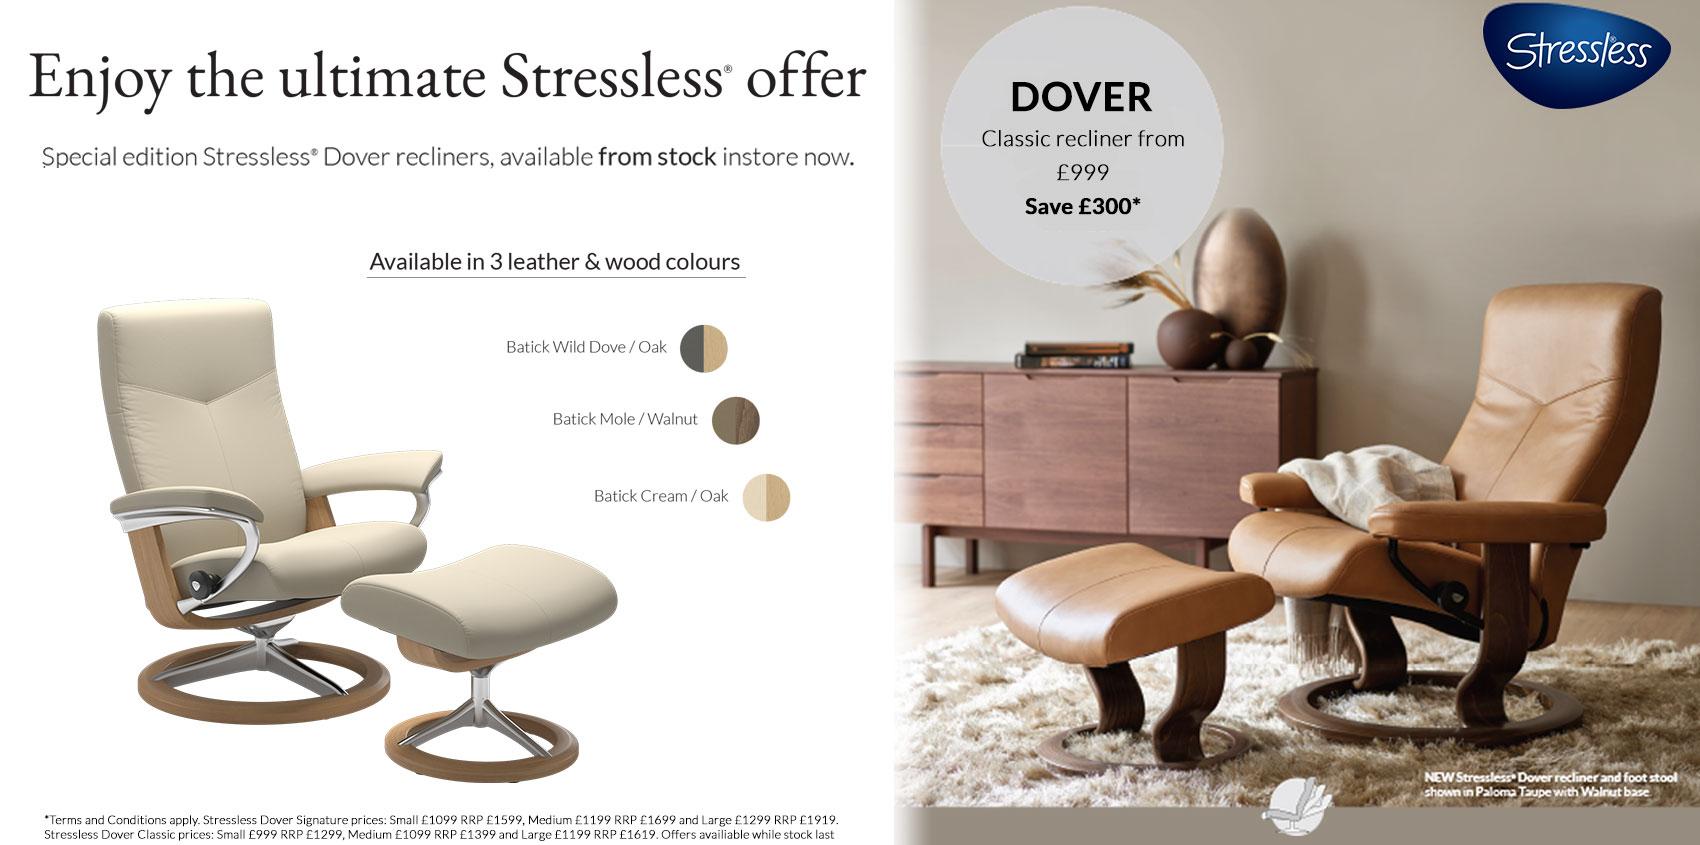 Stressless Dover Promotion 2020